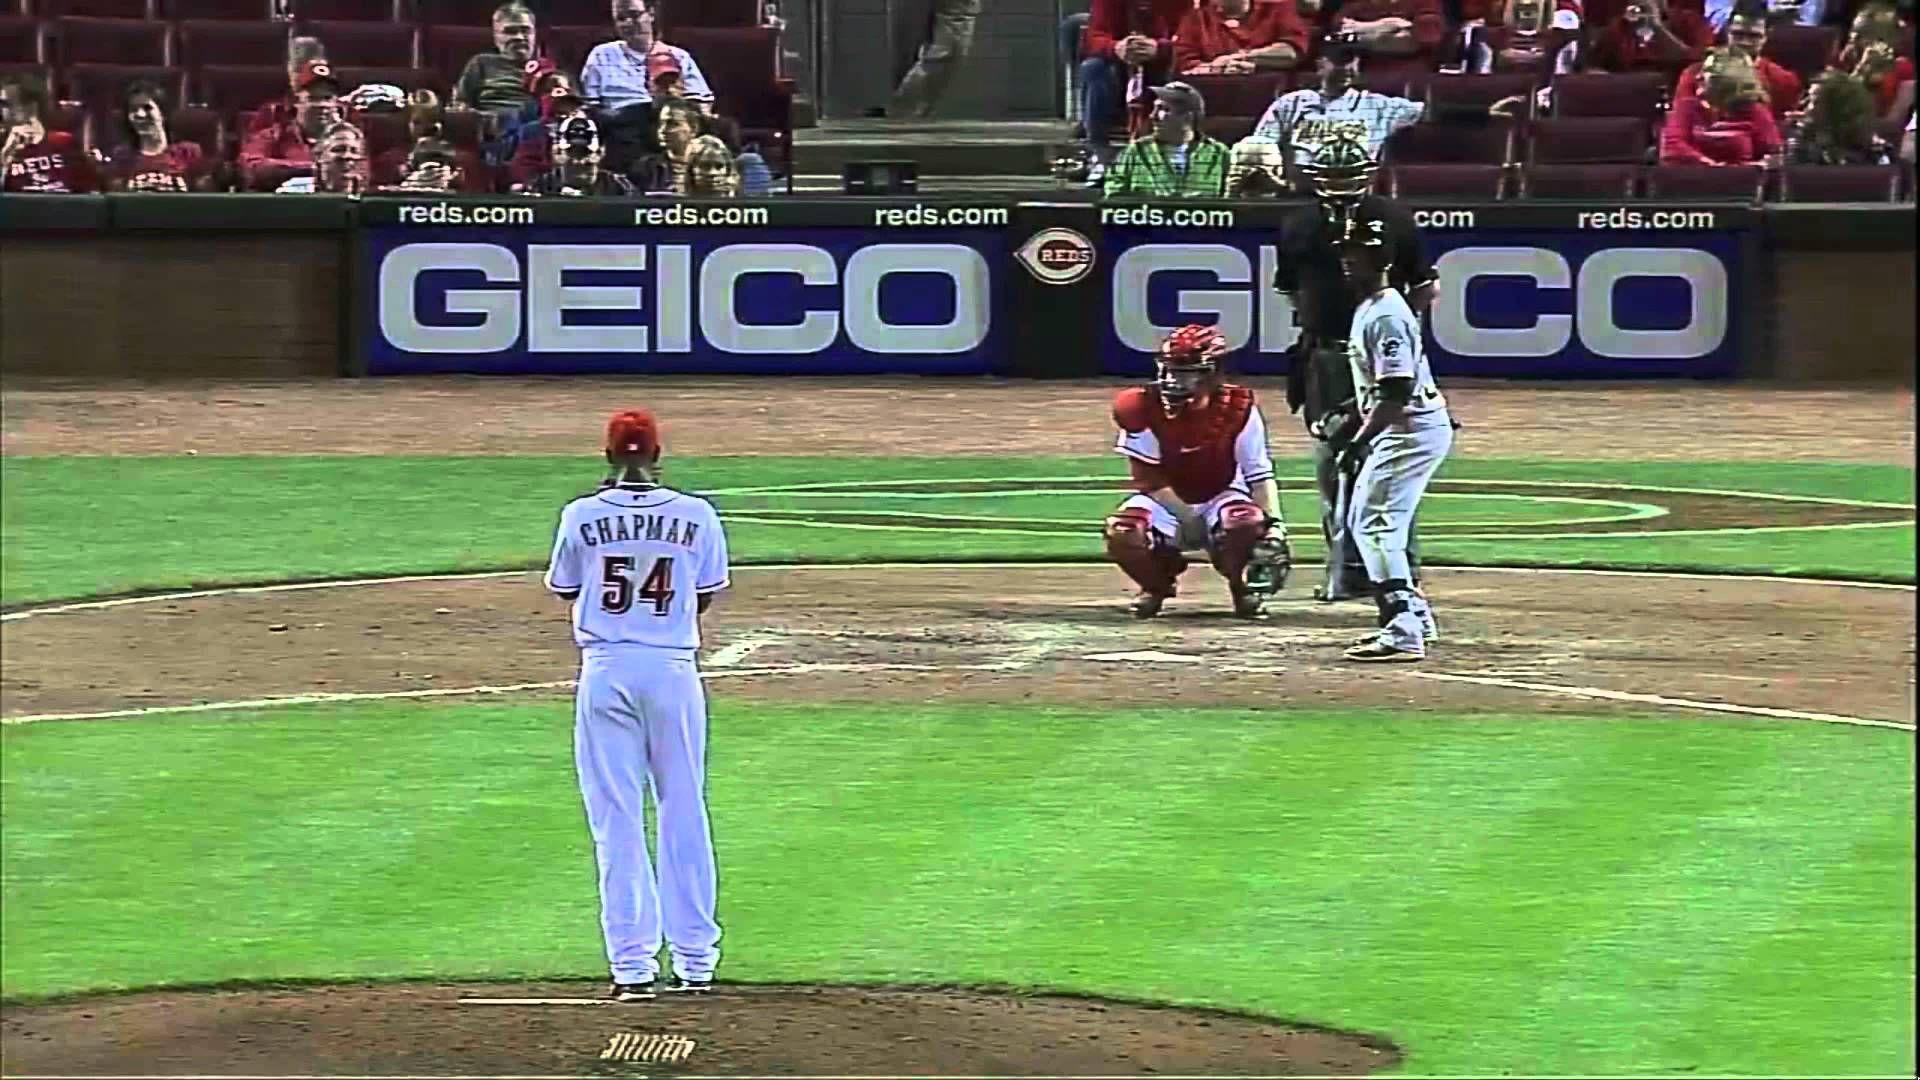 Mlb S Fastest Pitch Ever Recorded Baseball Baseball Records Baseball History